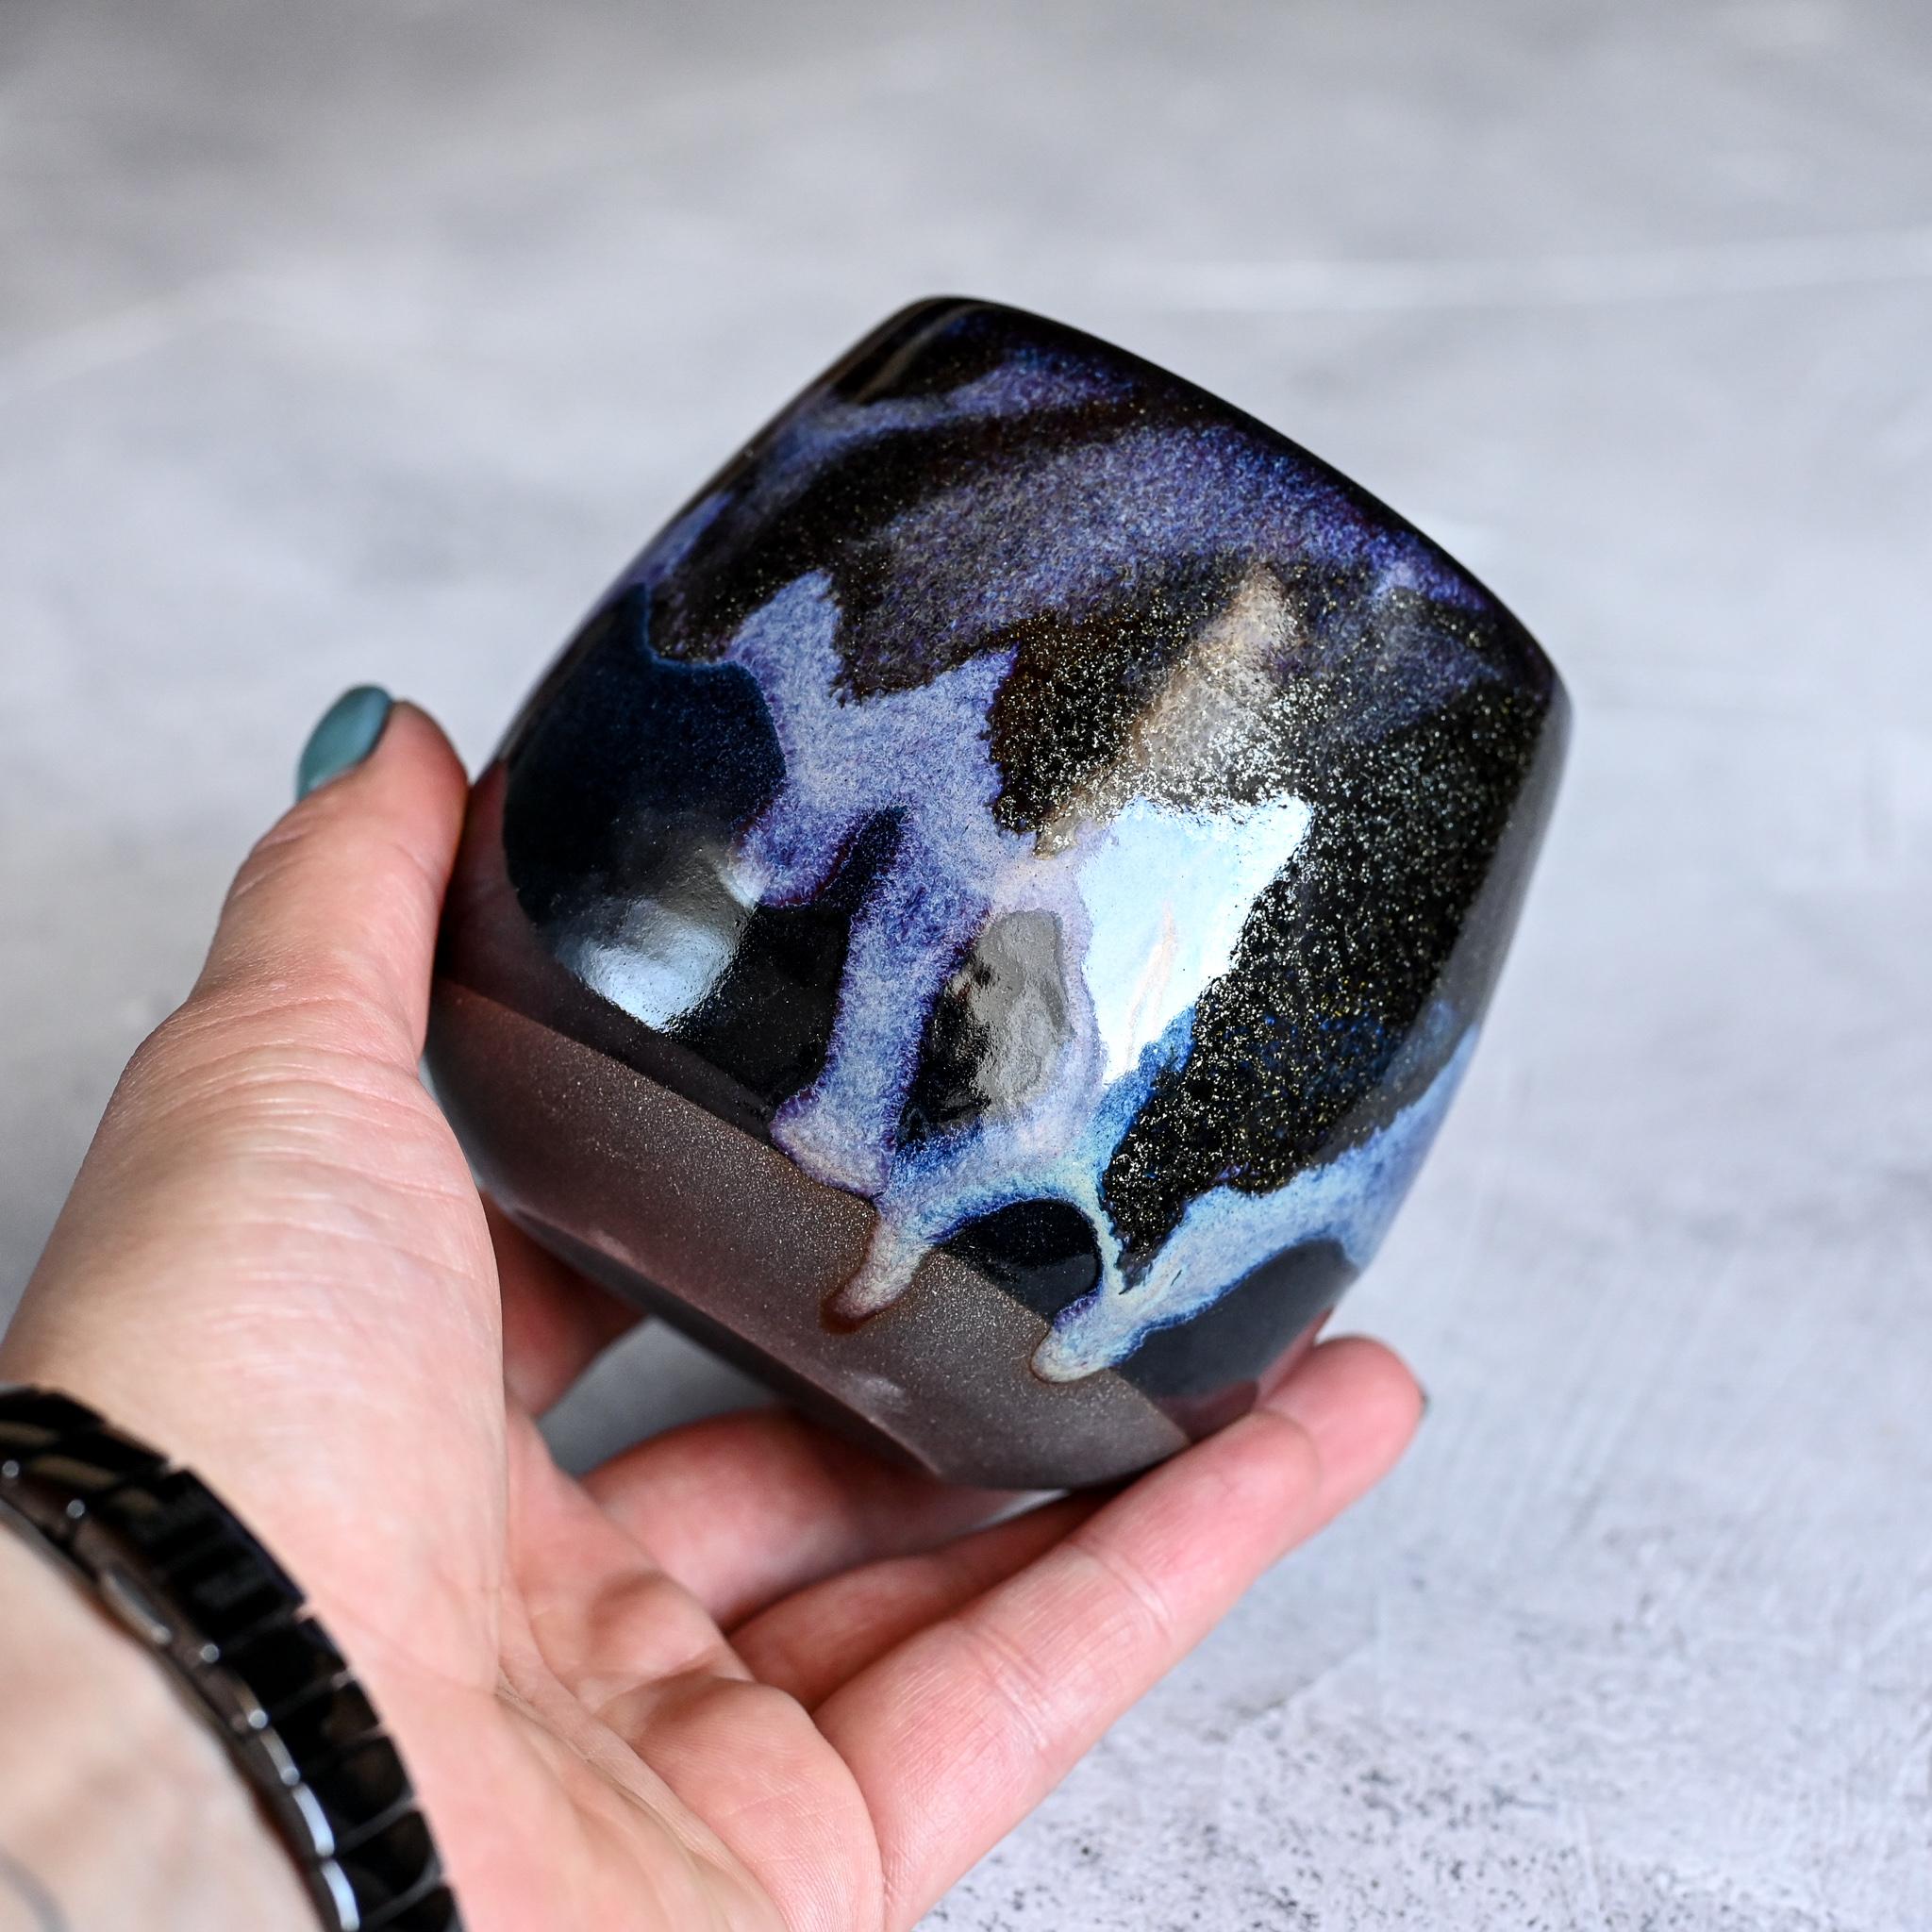 "картинка Керамический стакан Марии Левиной ""Космос"" 4 - DishWishes.Ru"